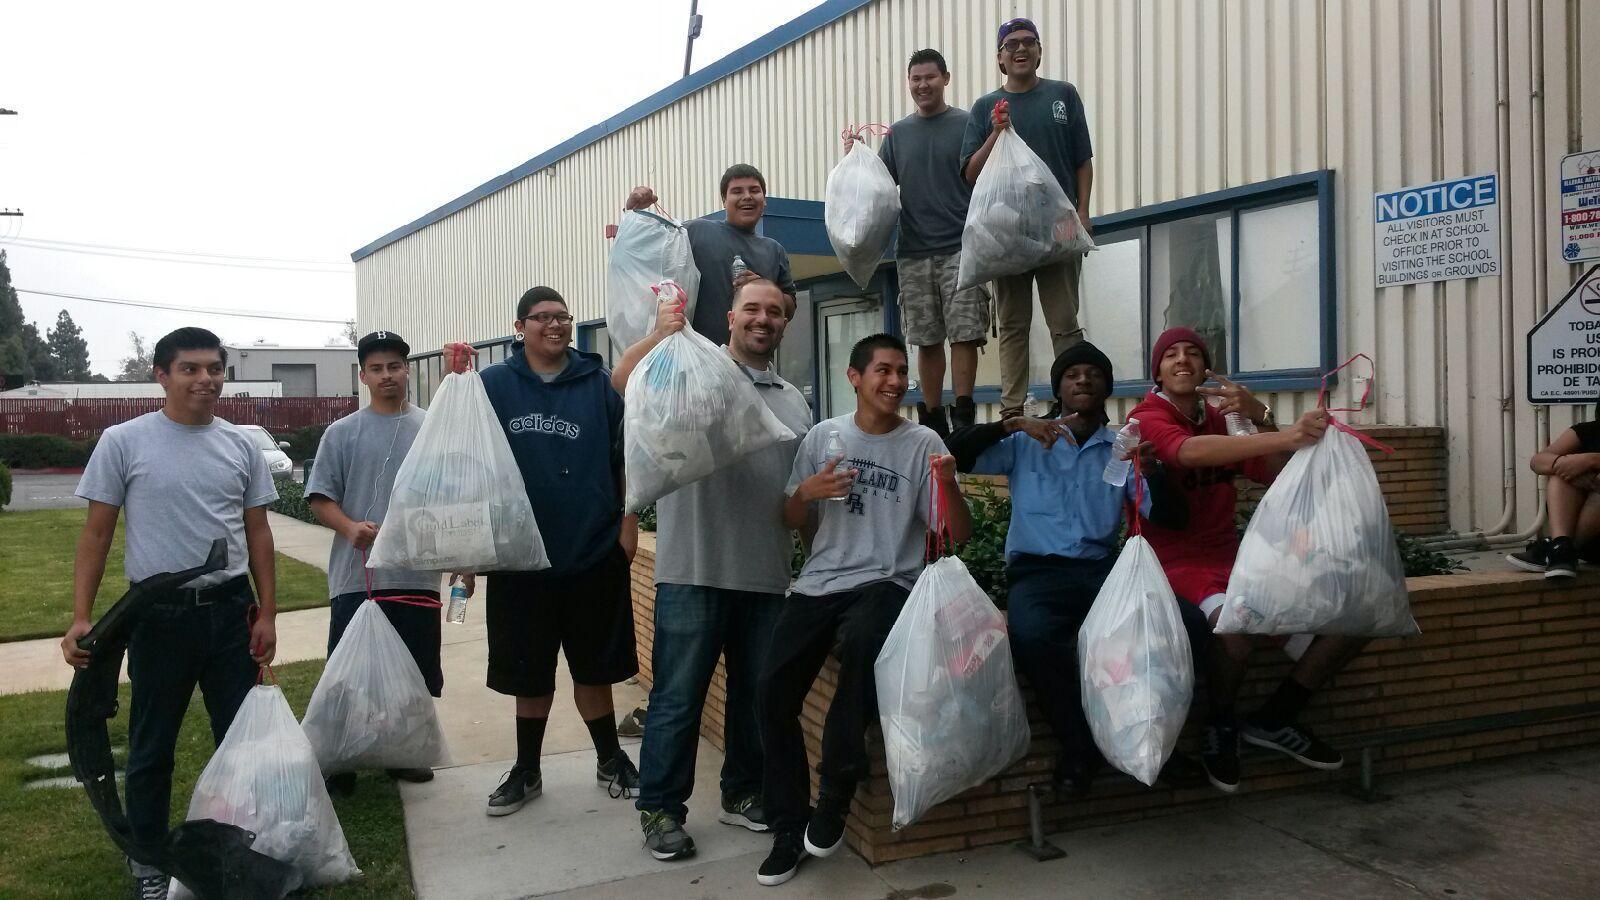 Pomona Recycling Students